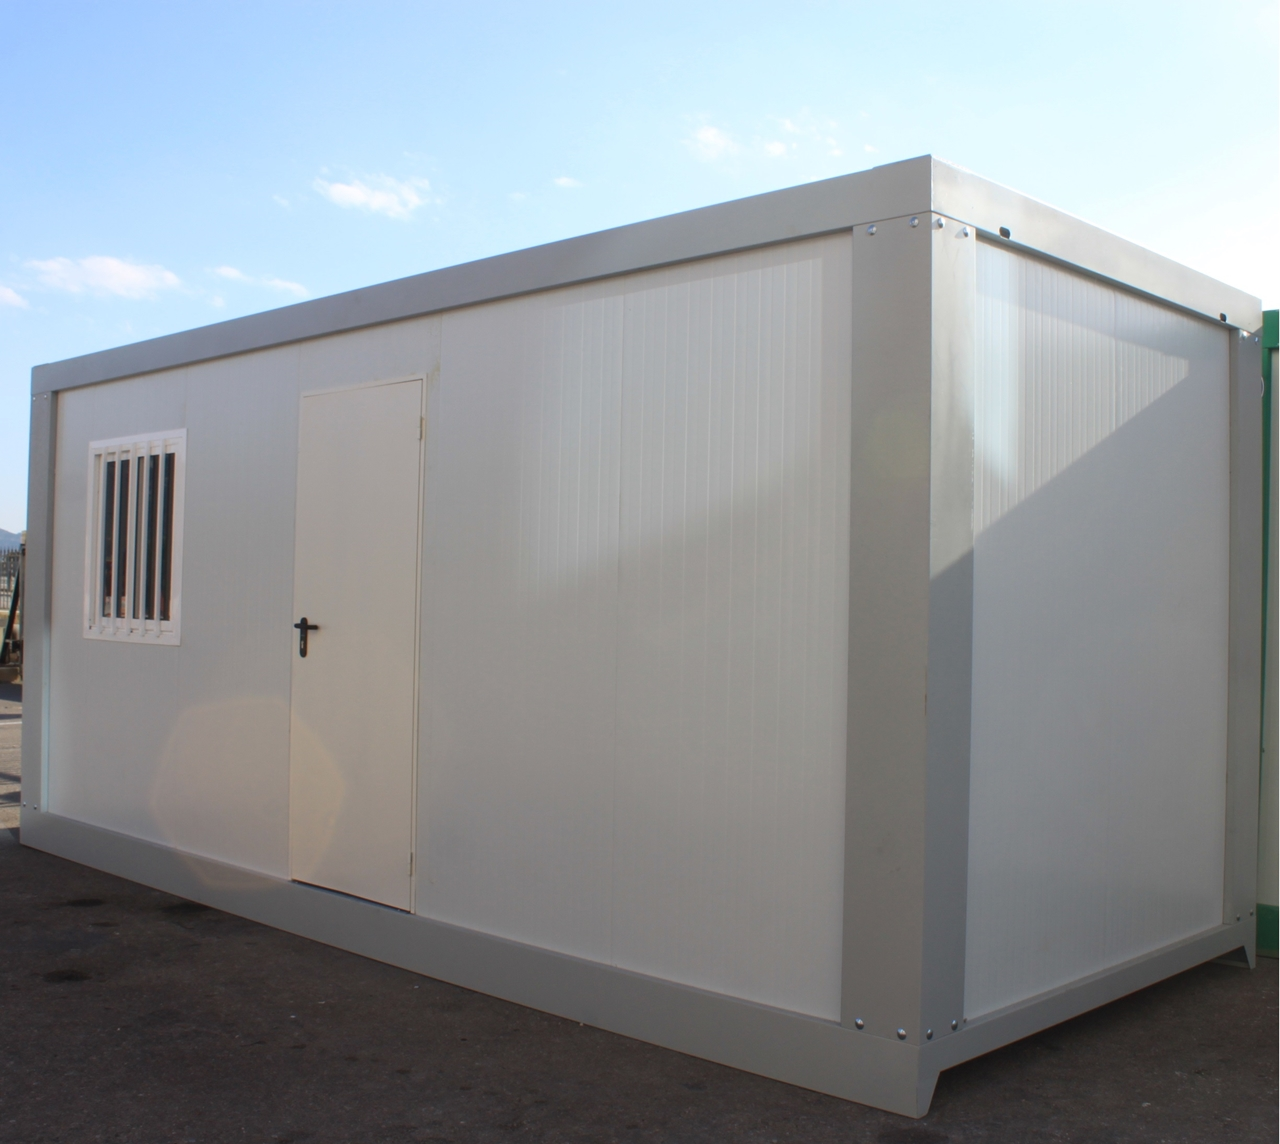 Caseta prefabricada di fana 6 metros globen for Casetas de almacenaje para jardin